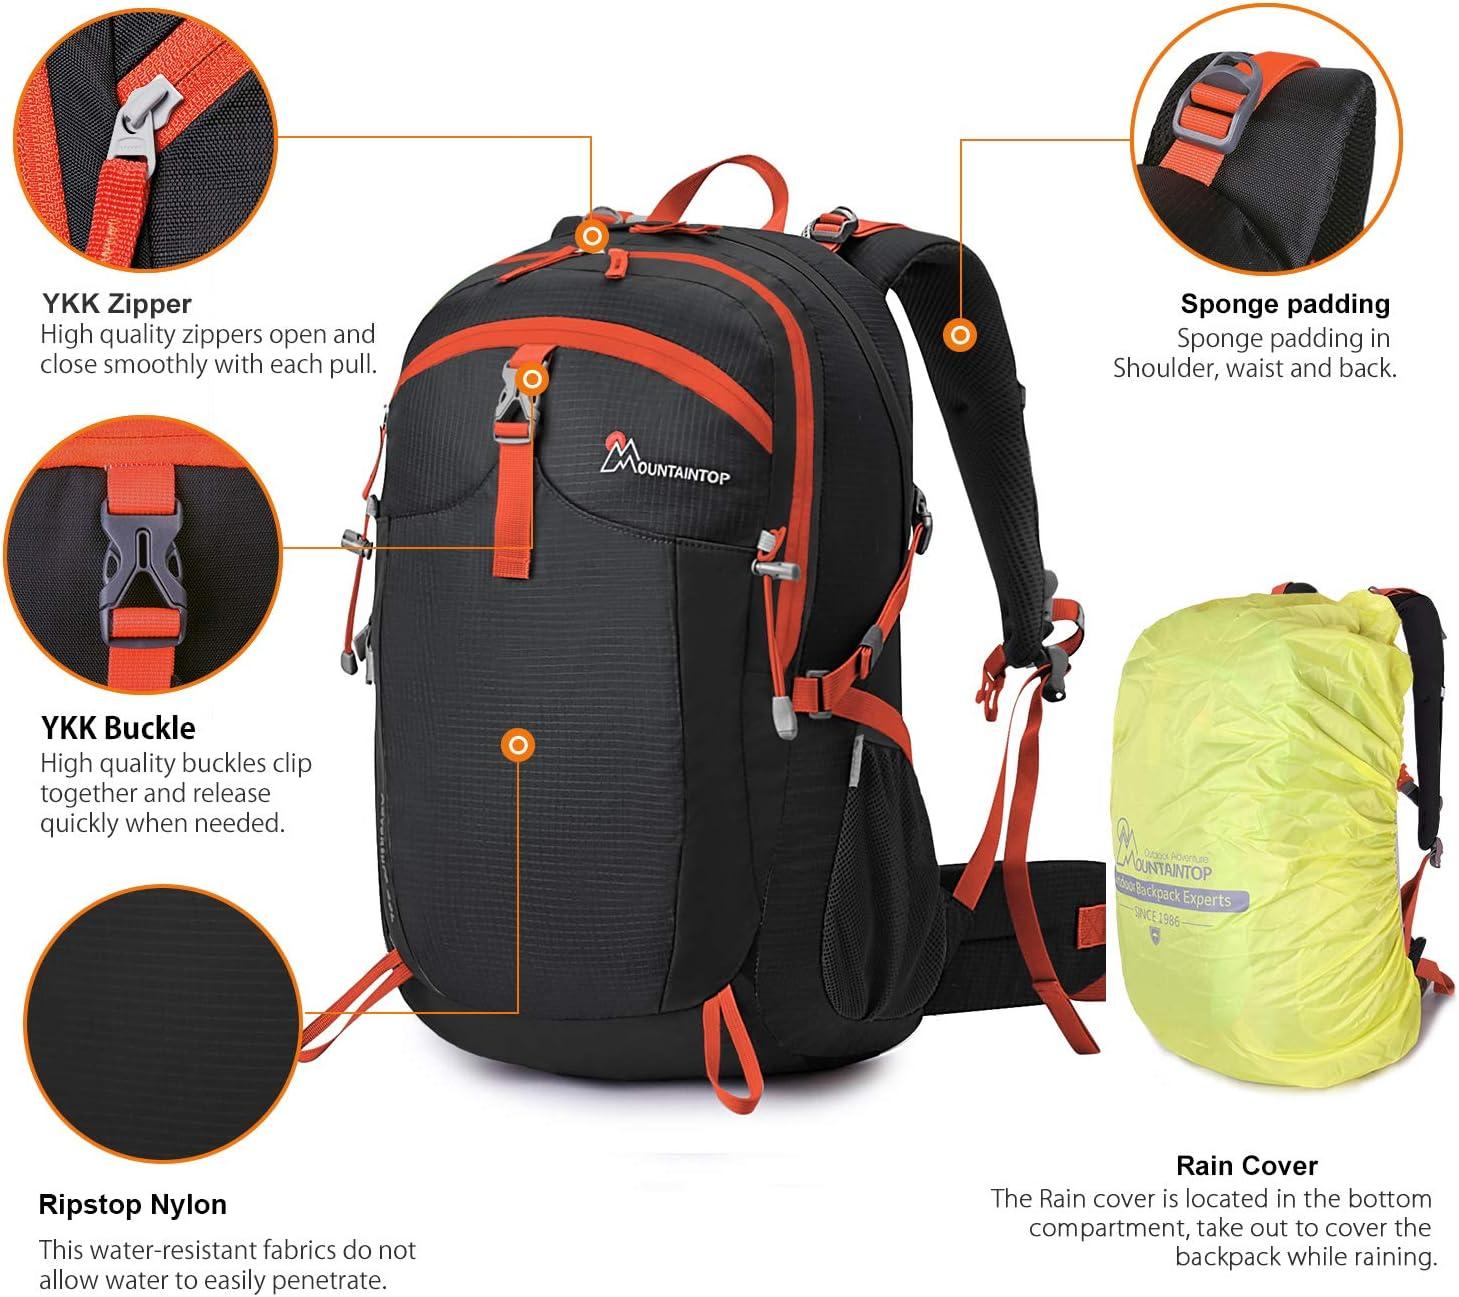 MOUNTAINTOP Mochila de Senderismo 40 litros con Cubierta Impermeable Mochila Deporte para Trekking Camping Viajes al Aire Libre